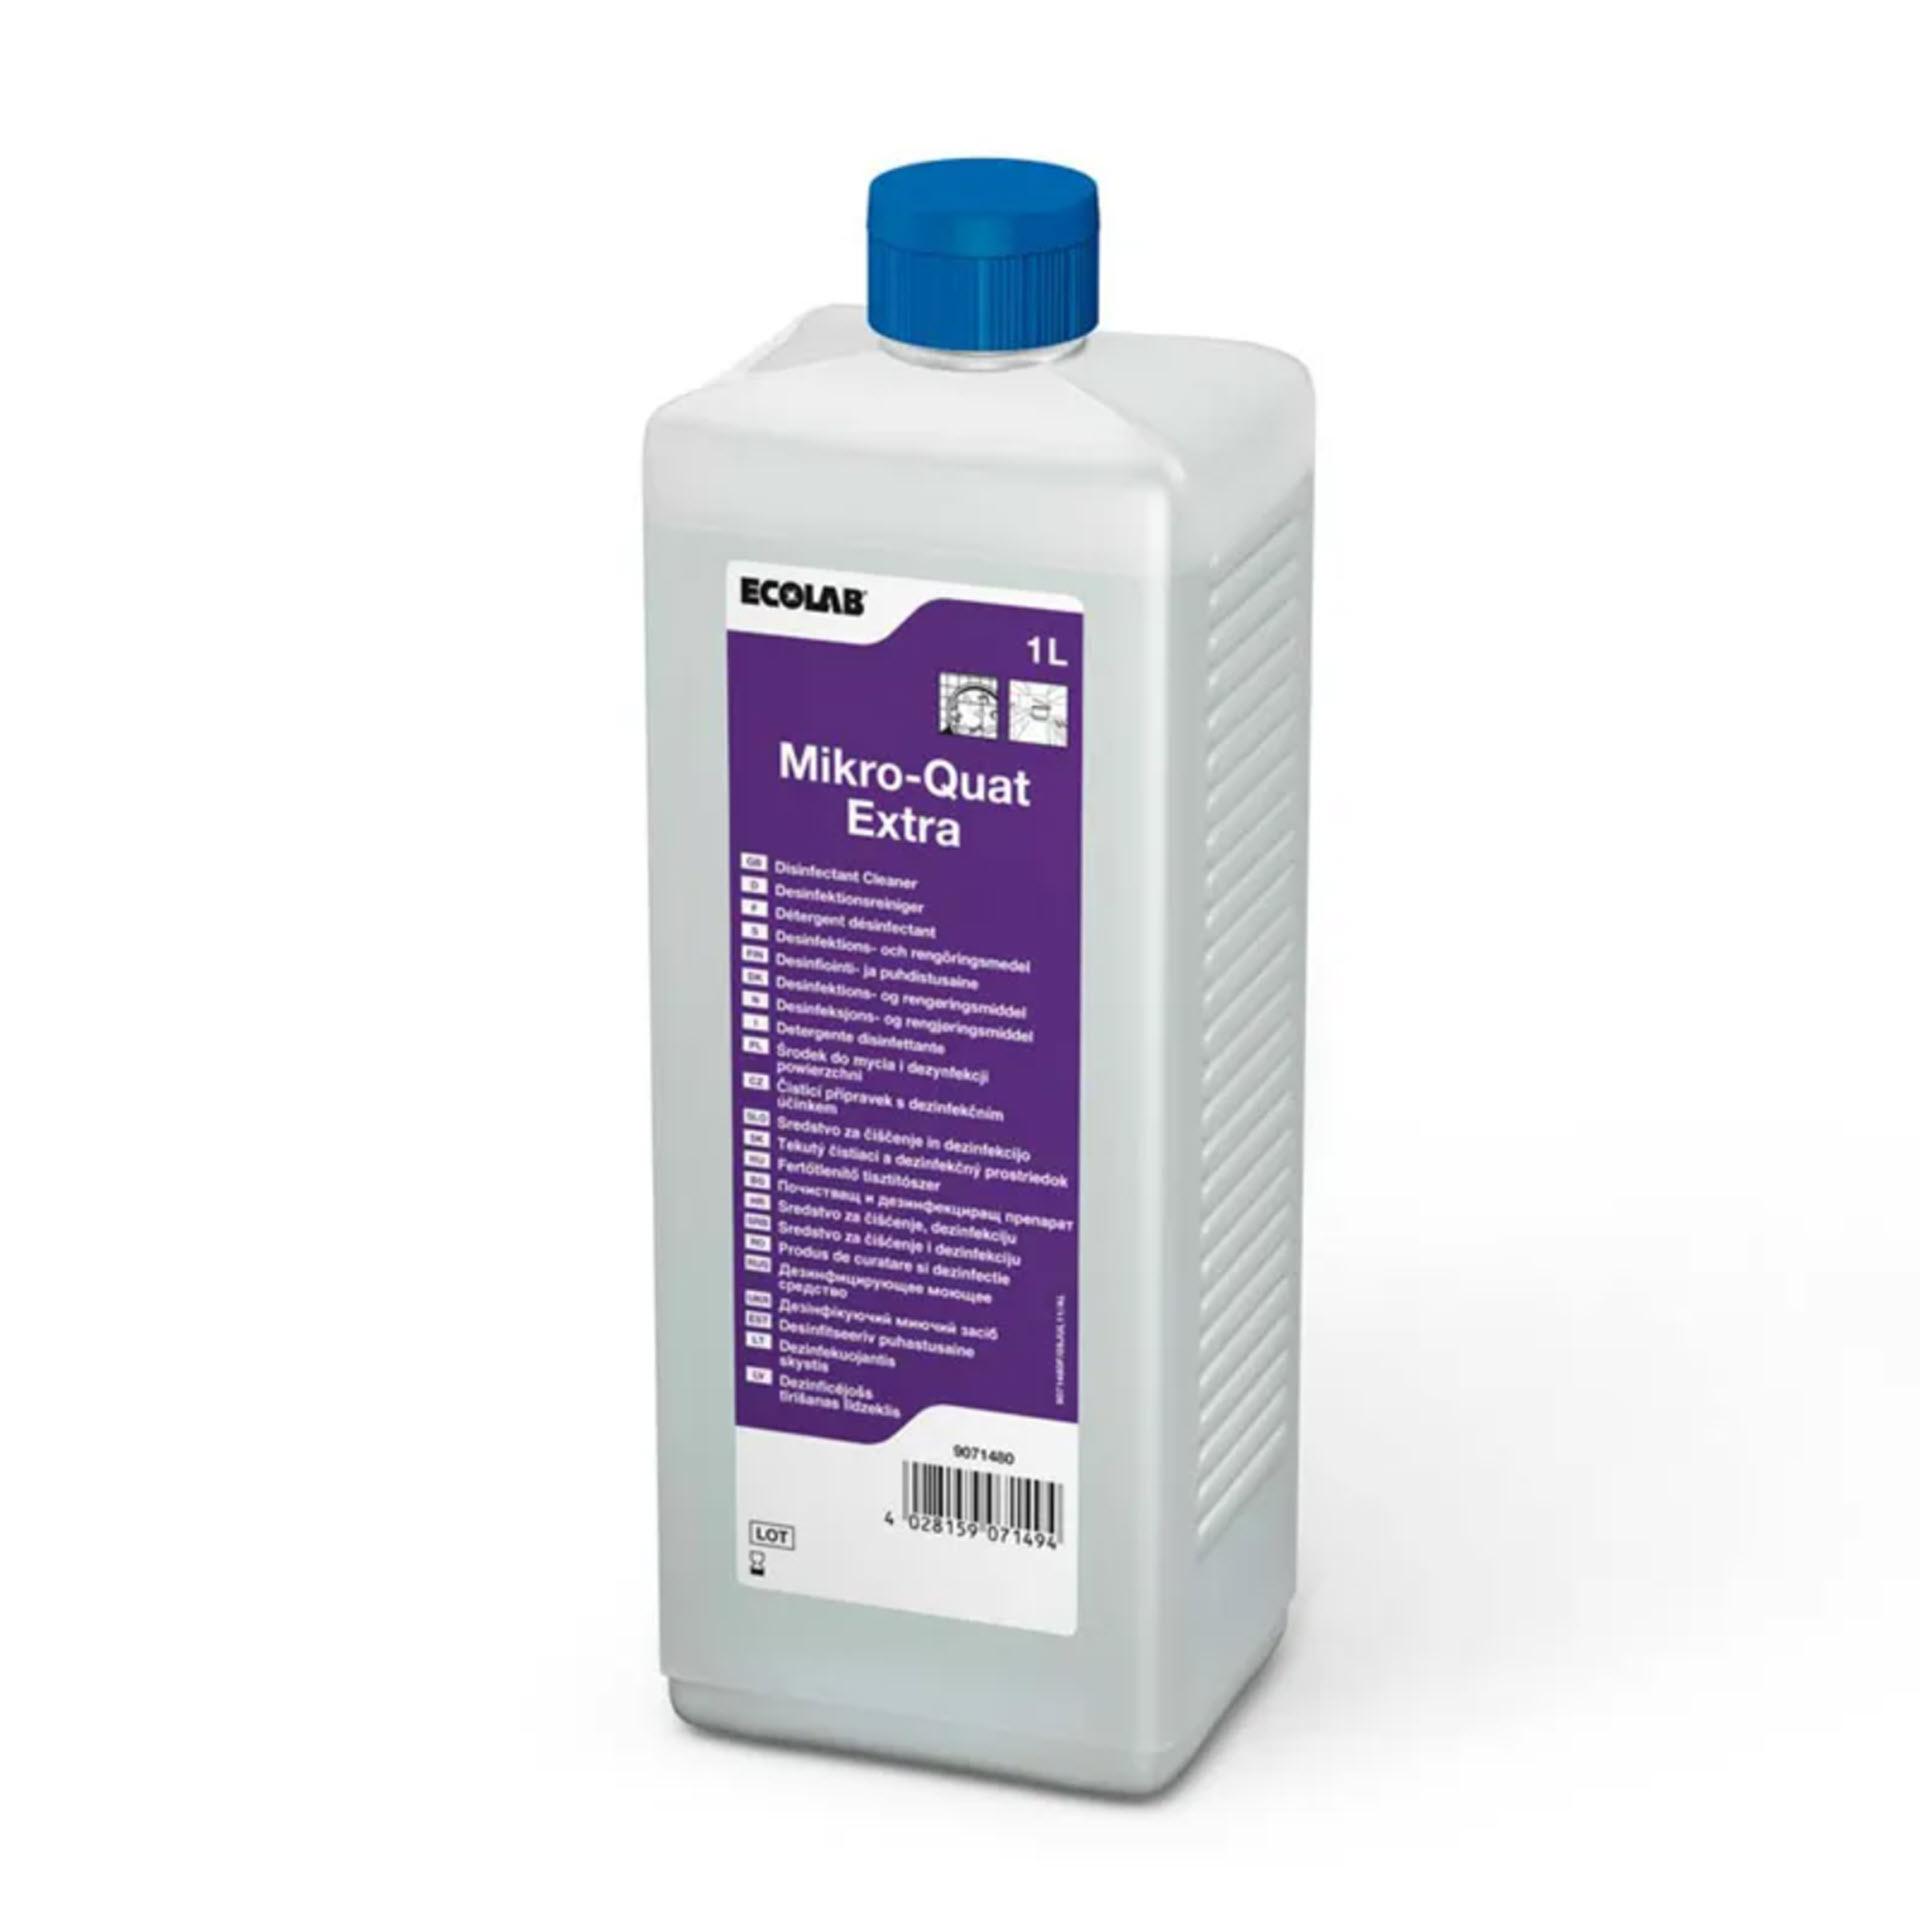 Ecolab Mirko-Quat Extra Desinfektionsreiniger